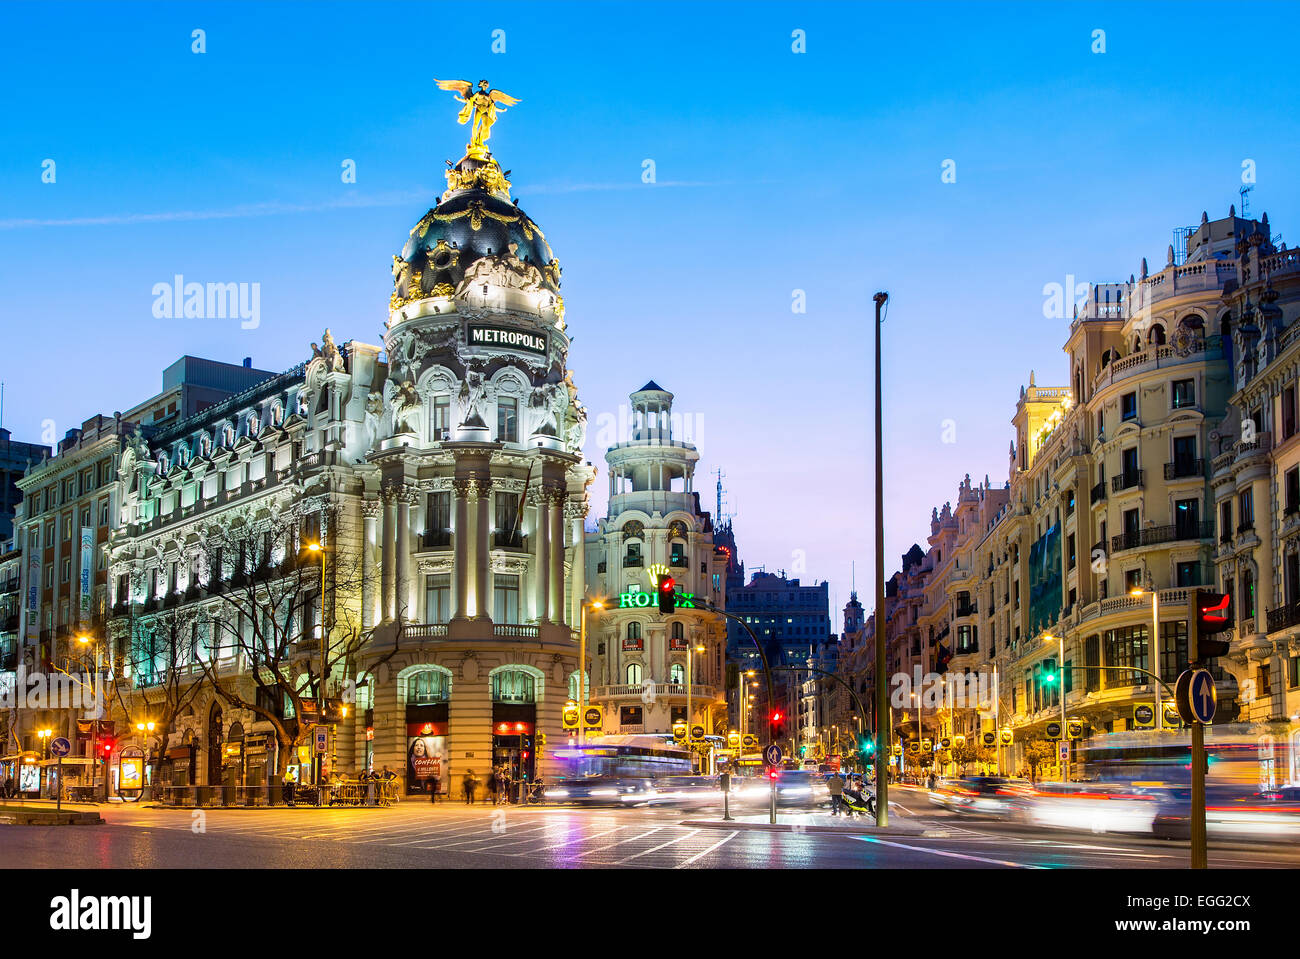 Madrid, Metropolis Building and Gran Via at night - Stock Image